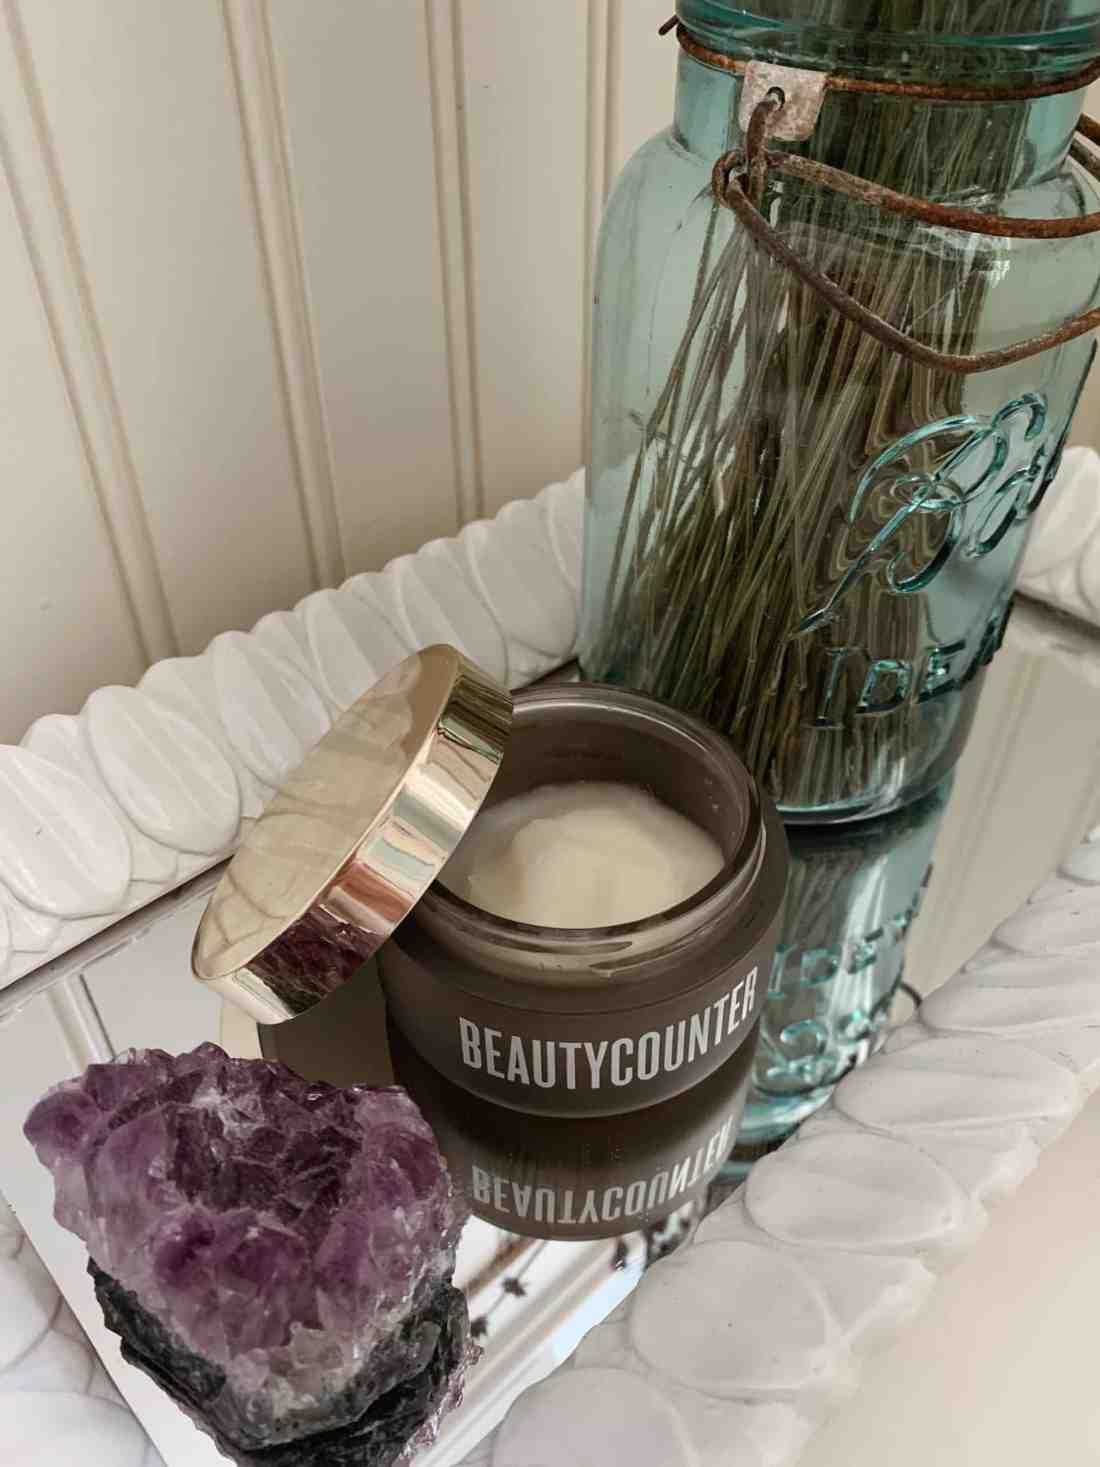 Beautycounter Lotus Glow Cleansing Balm